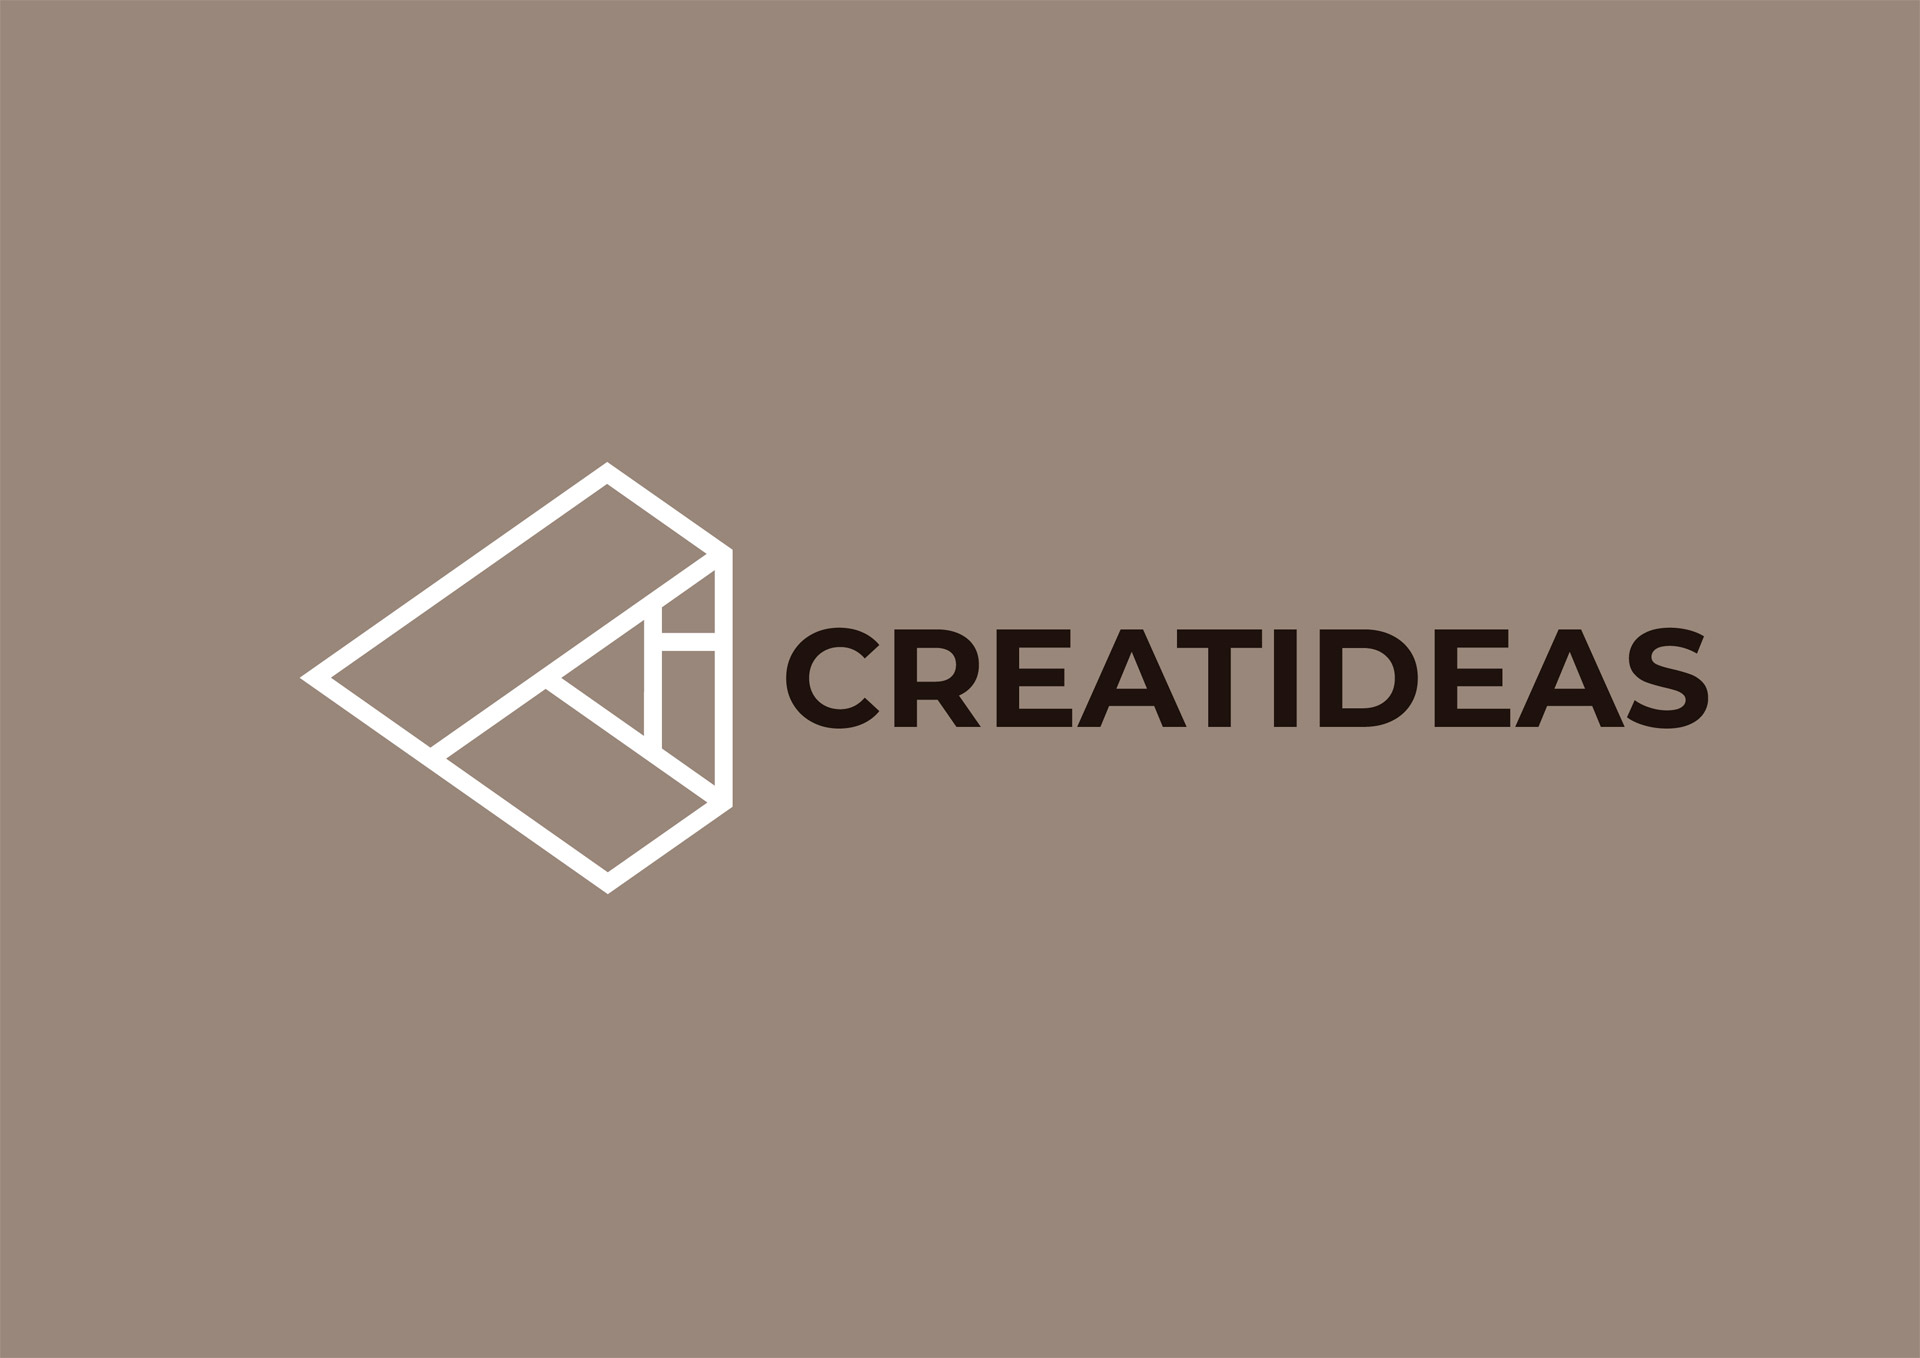 Creatideas general 2021